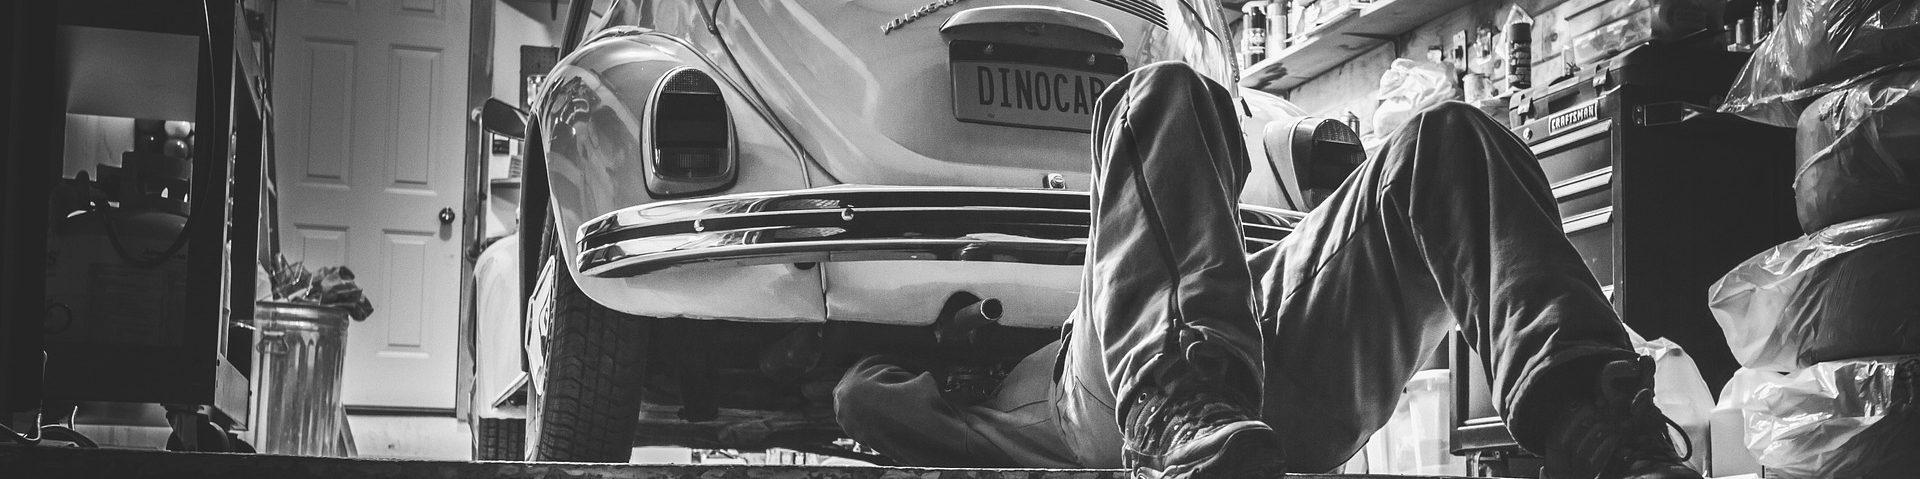 YAKAR : Recuperation de voiture